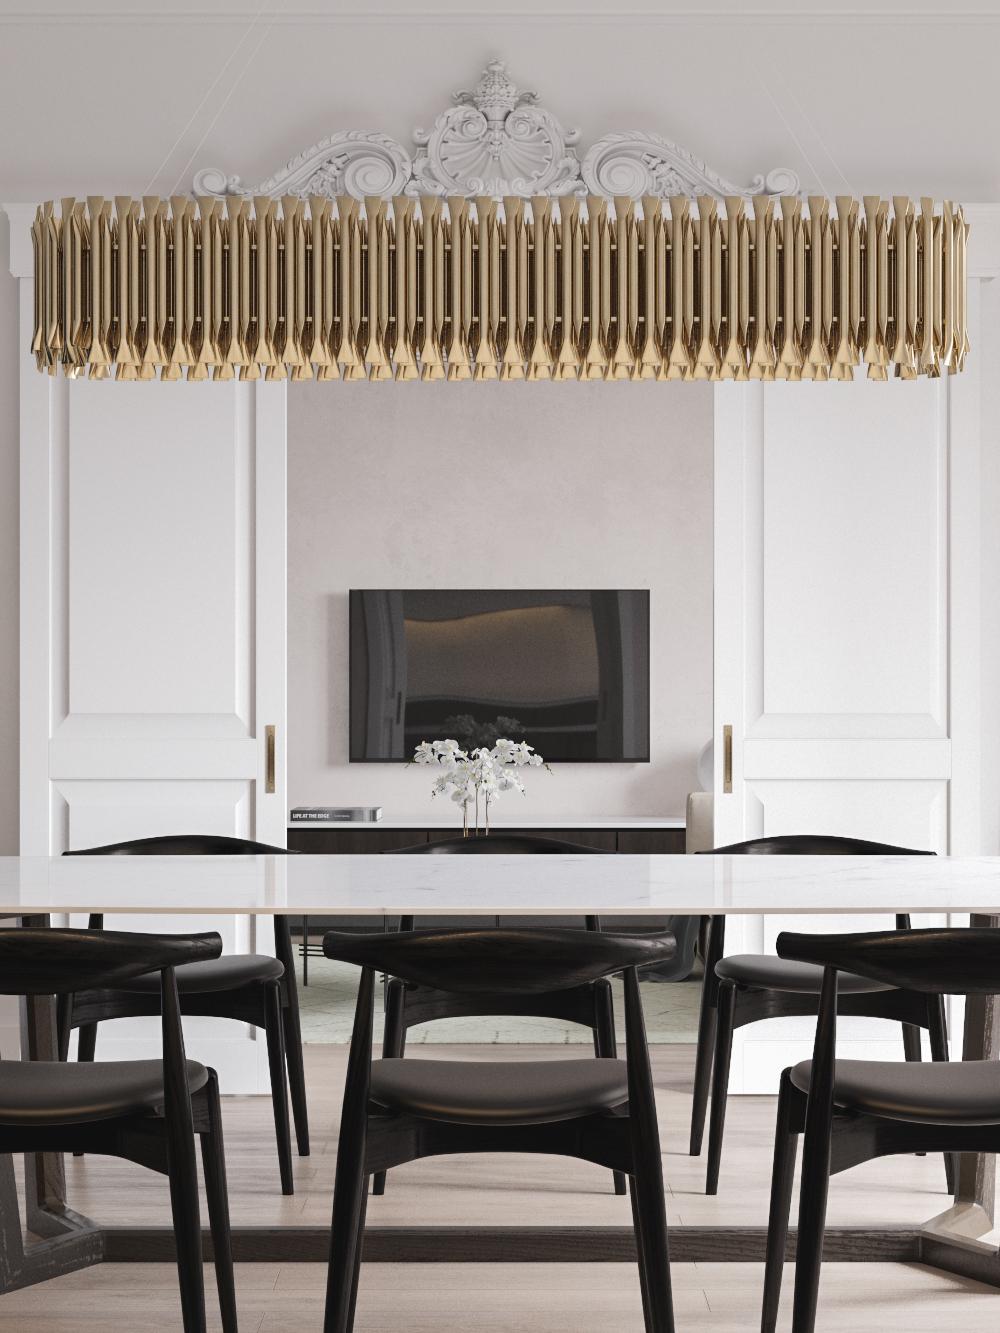 http://http://modernfloorlamps.net/?utm_source=sgomes&utm_medium=BlogUnique&utm_campaign=Linkstexto interior design project White, Gold & Classic Interior Design Project You'll Love White Gold Classic Interior Design Project Youll Love 4